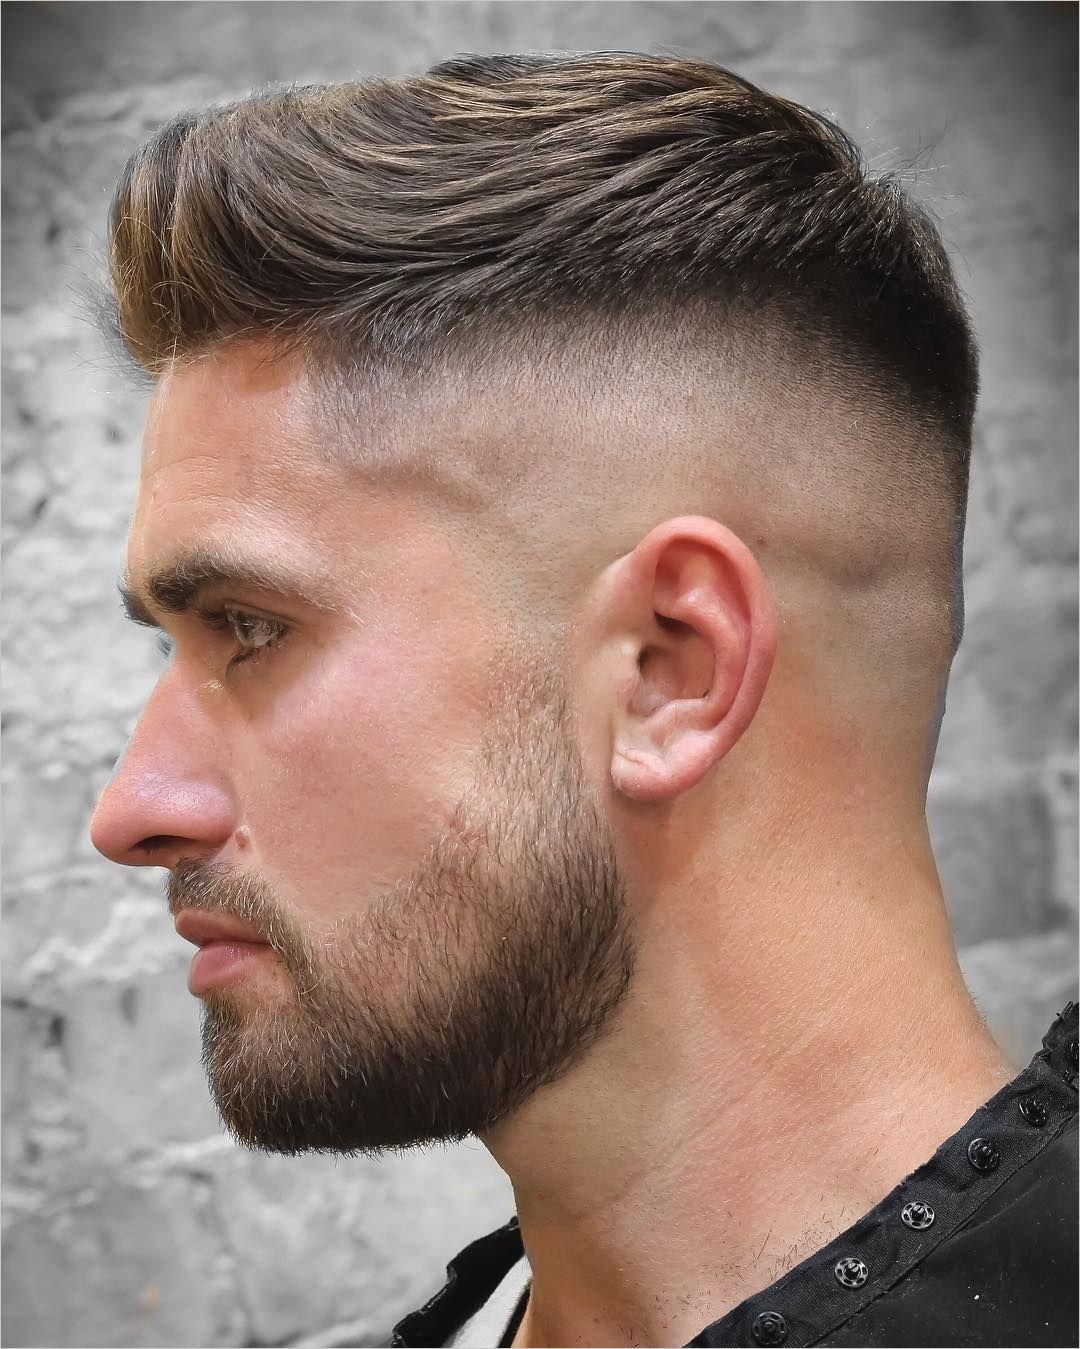 Herrenfrisuren Kurz | Männer frisur kurz, Haar frisuren